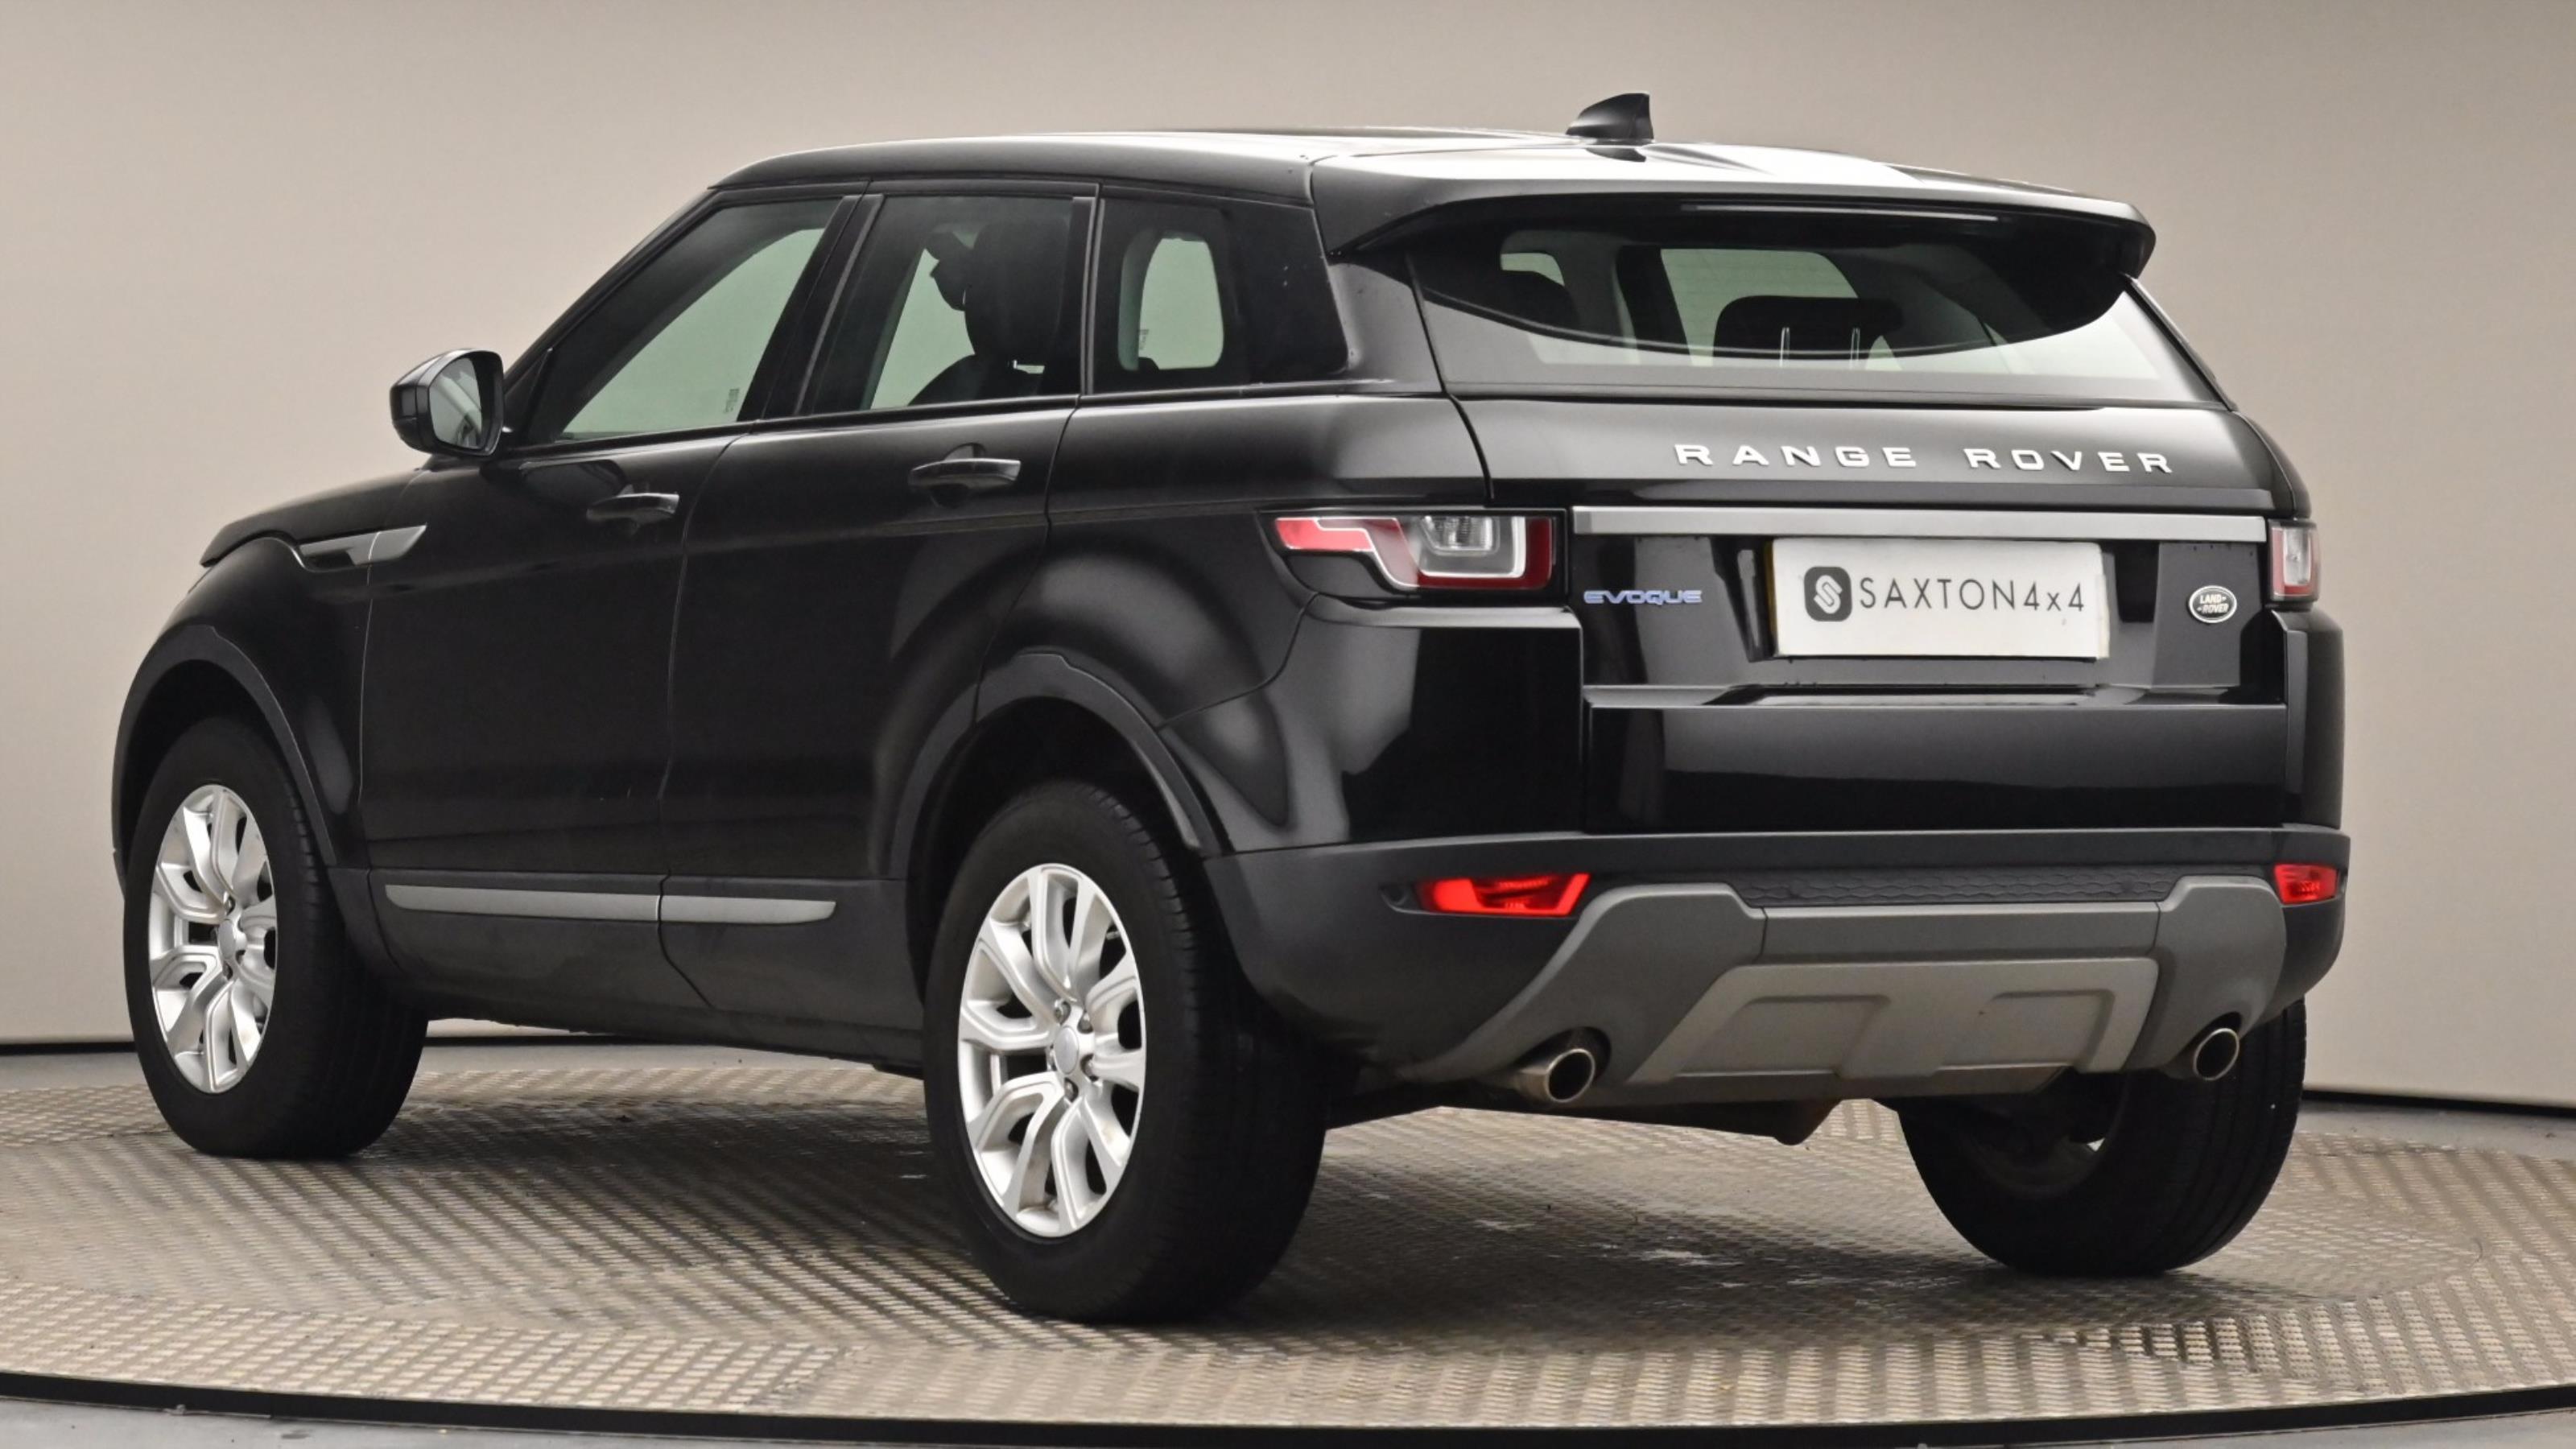 Used 16 Land Rover RANGE ROVER EVOQUE 2.0 eD4 SE 5dr 2WD BLACK at Saxton4x4